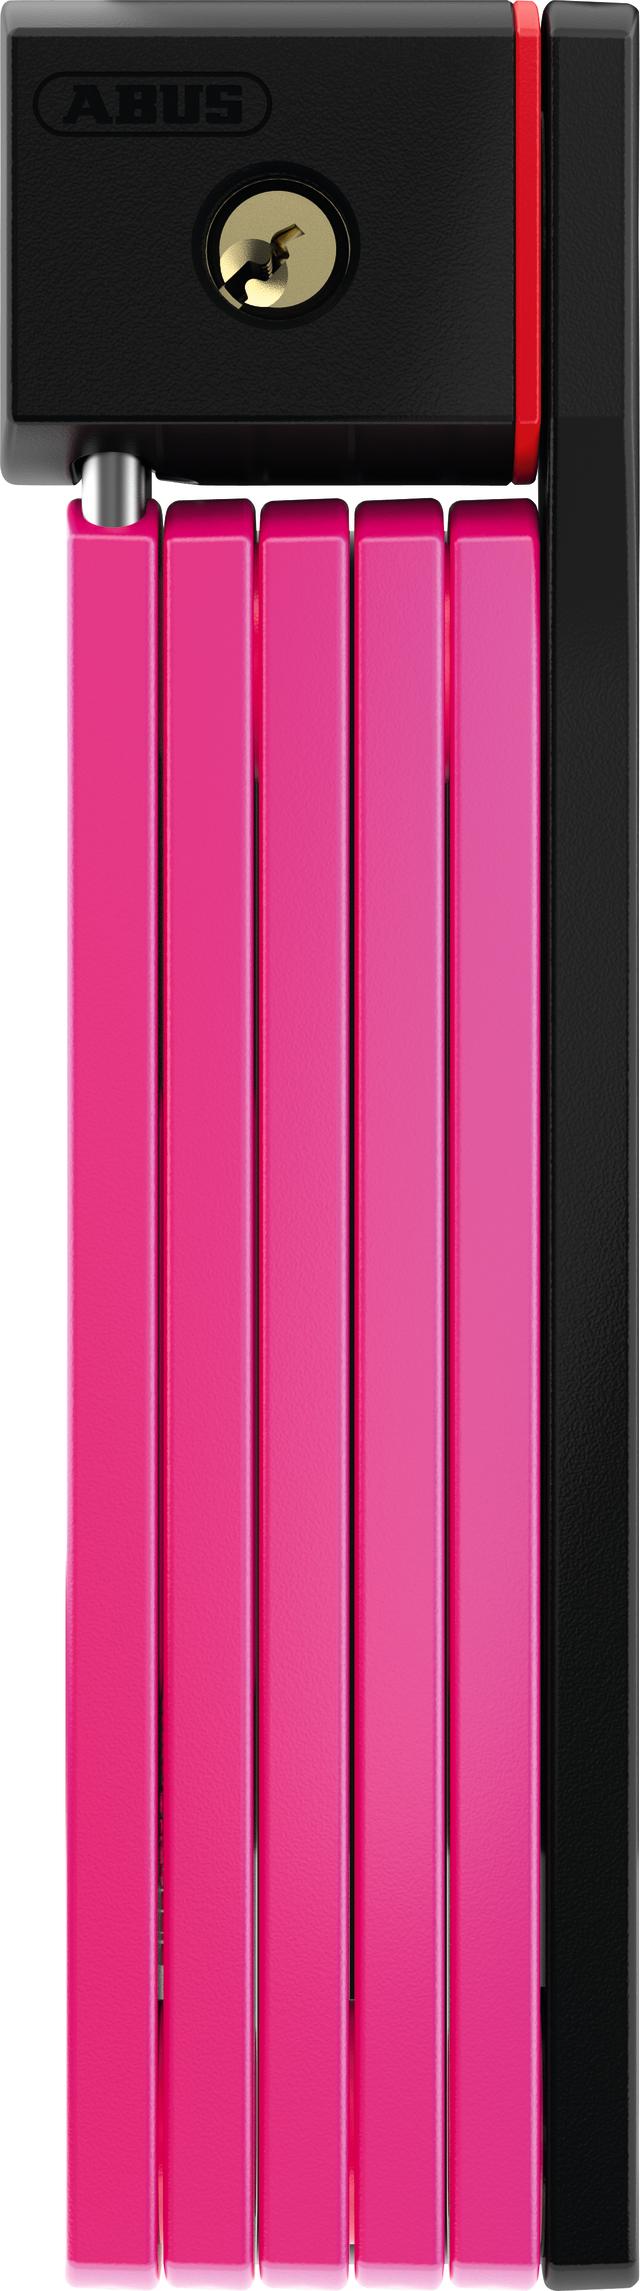 Folding Lock 5700/80 pink